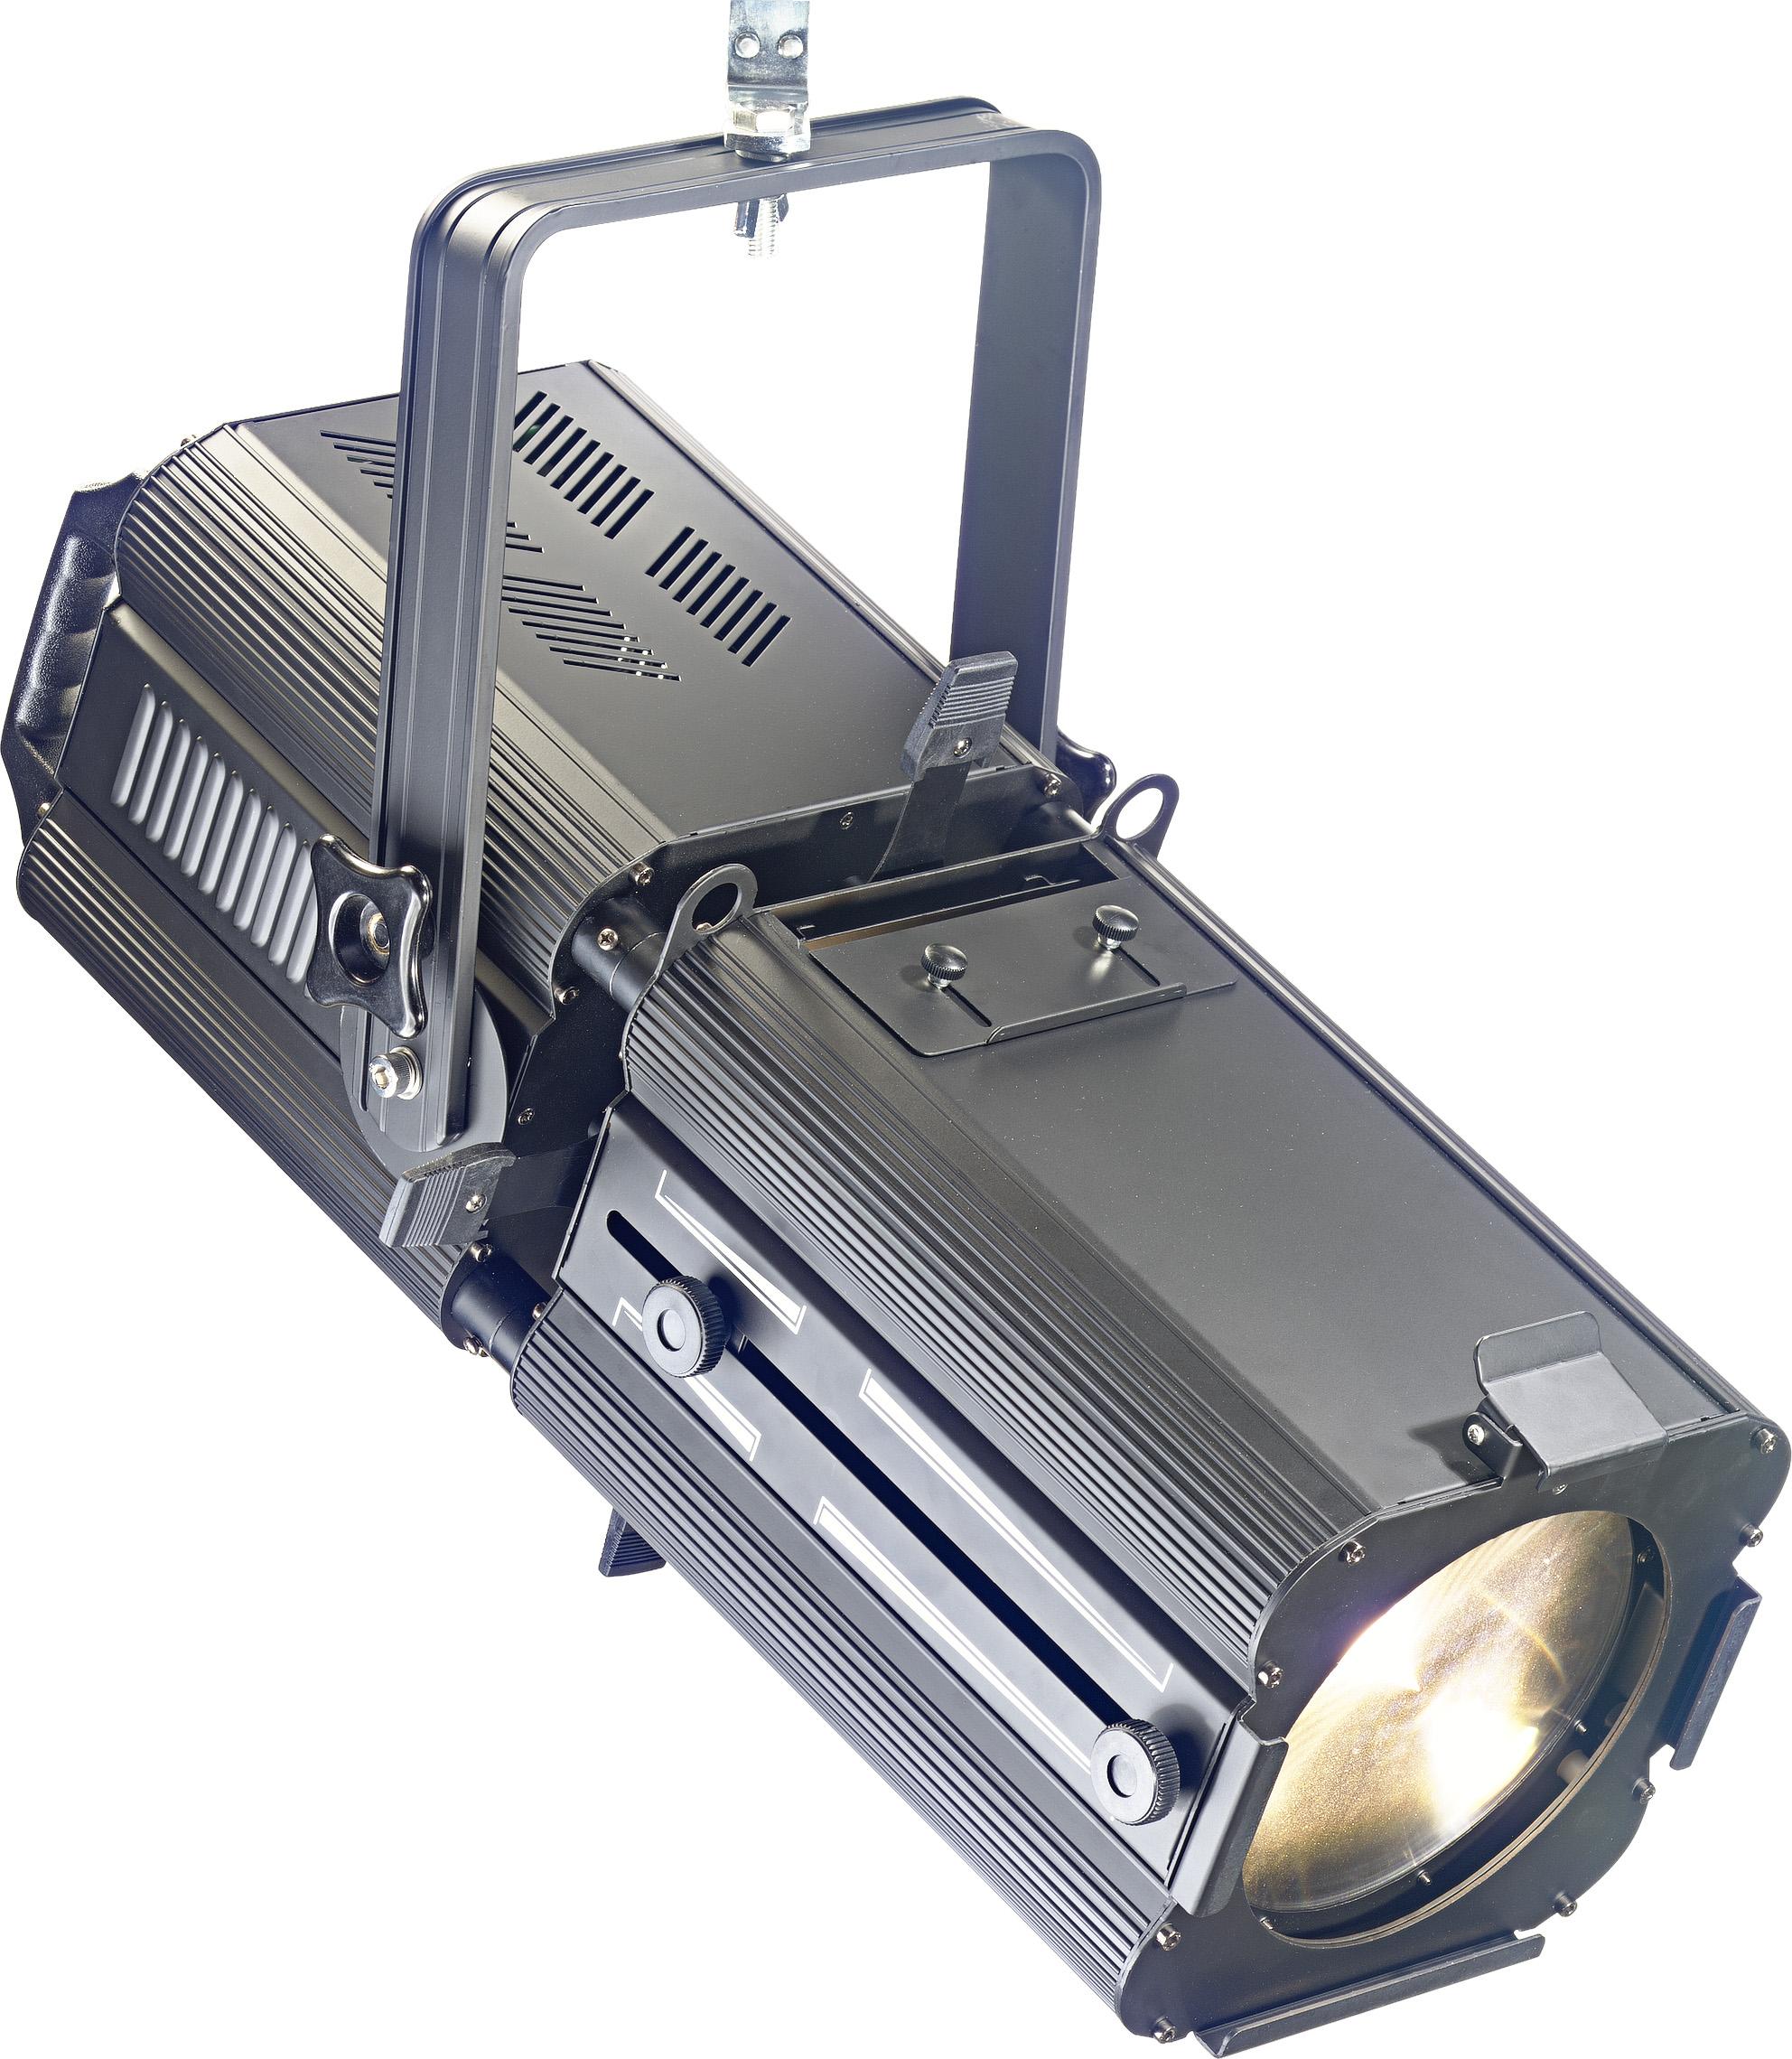 Stagg SLP200Z divadelní reflektor, 1x200W COB 6500K DMX, 17 - 50, černý